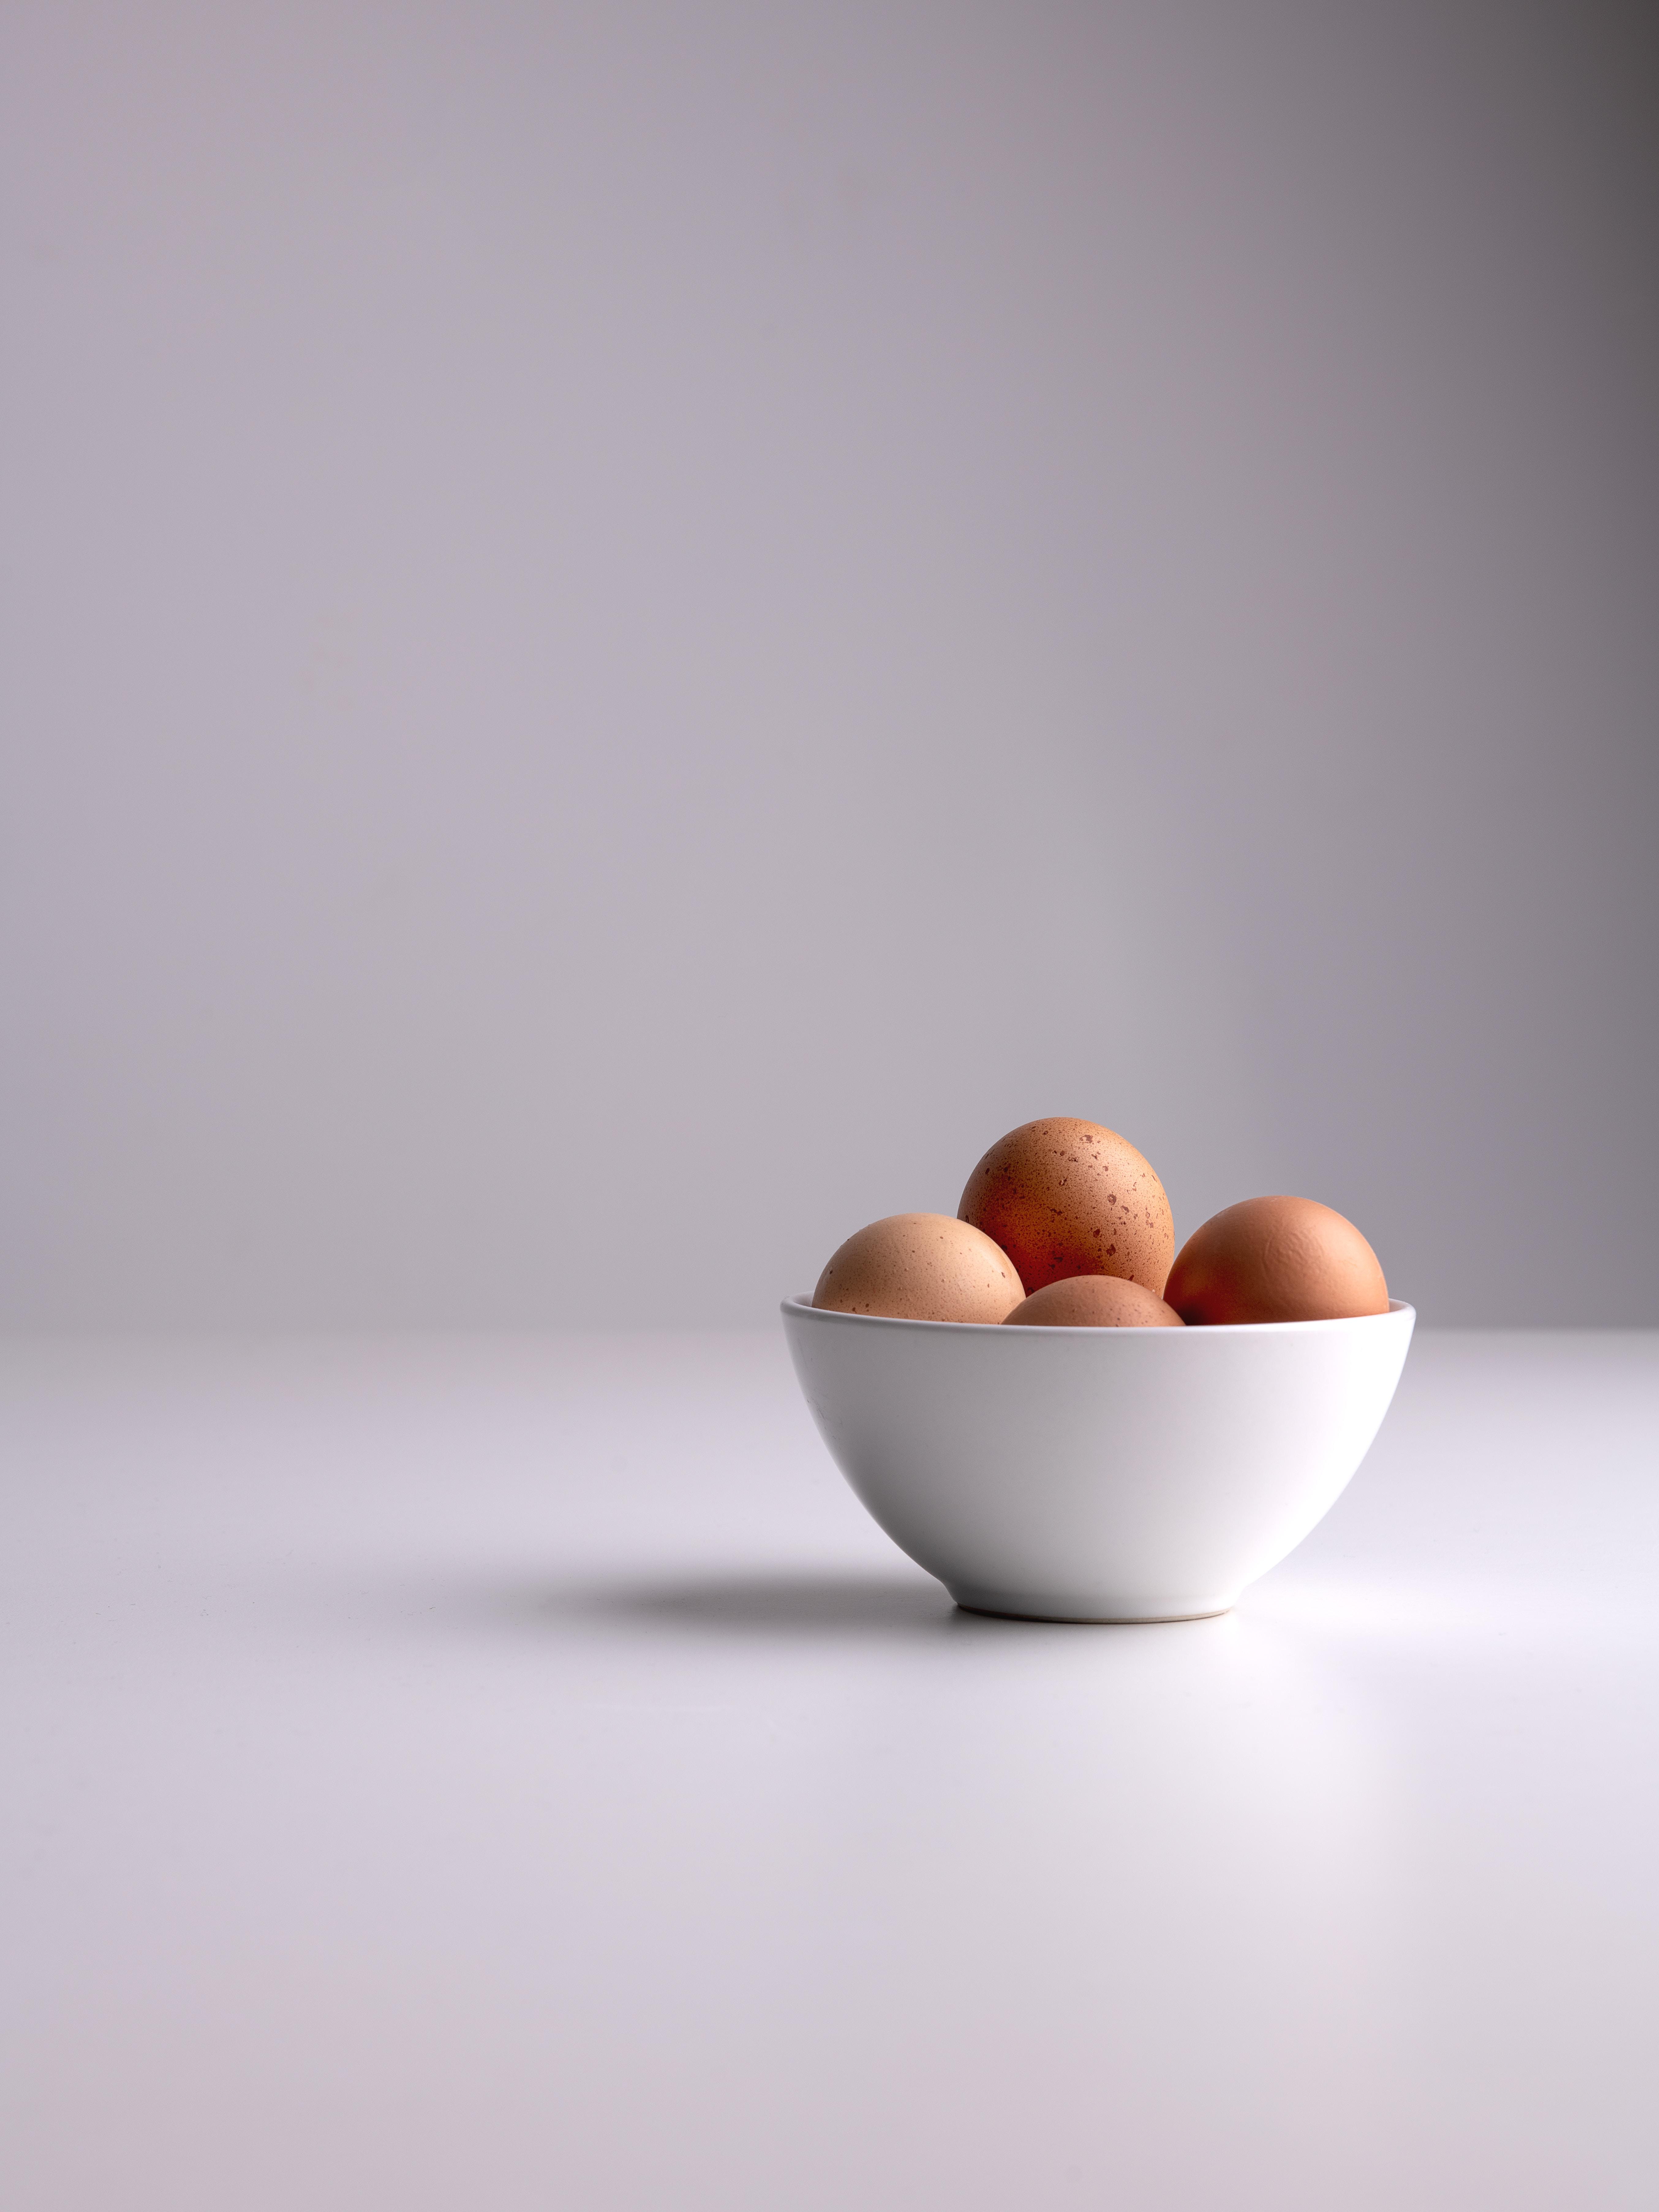 white and brown ceramic bowl